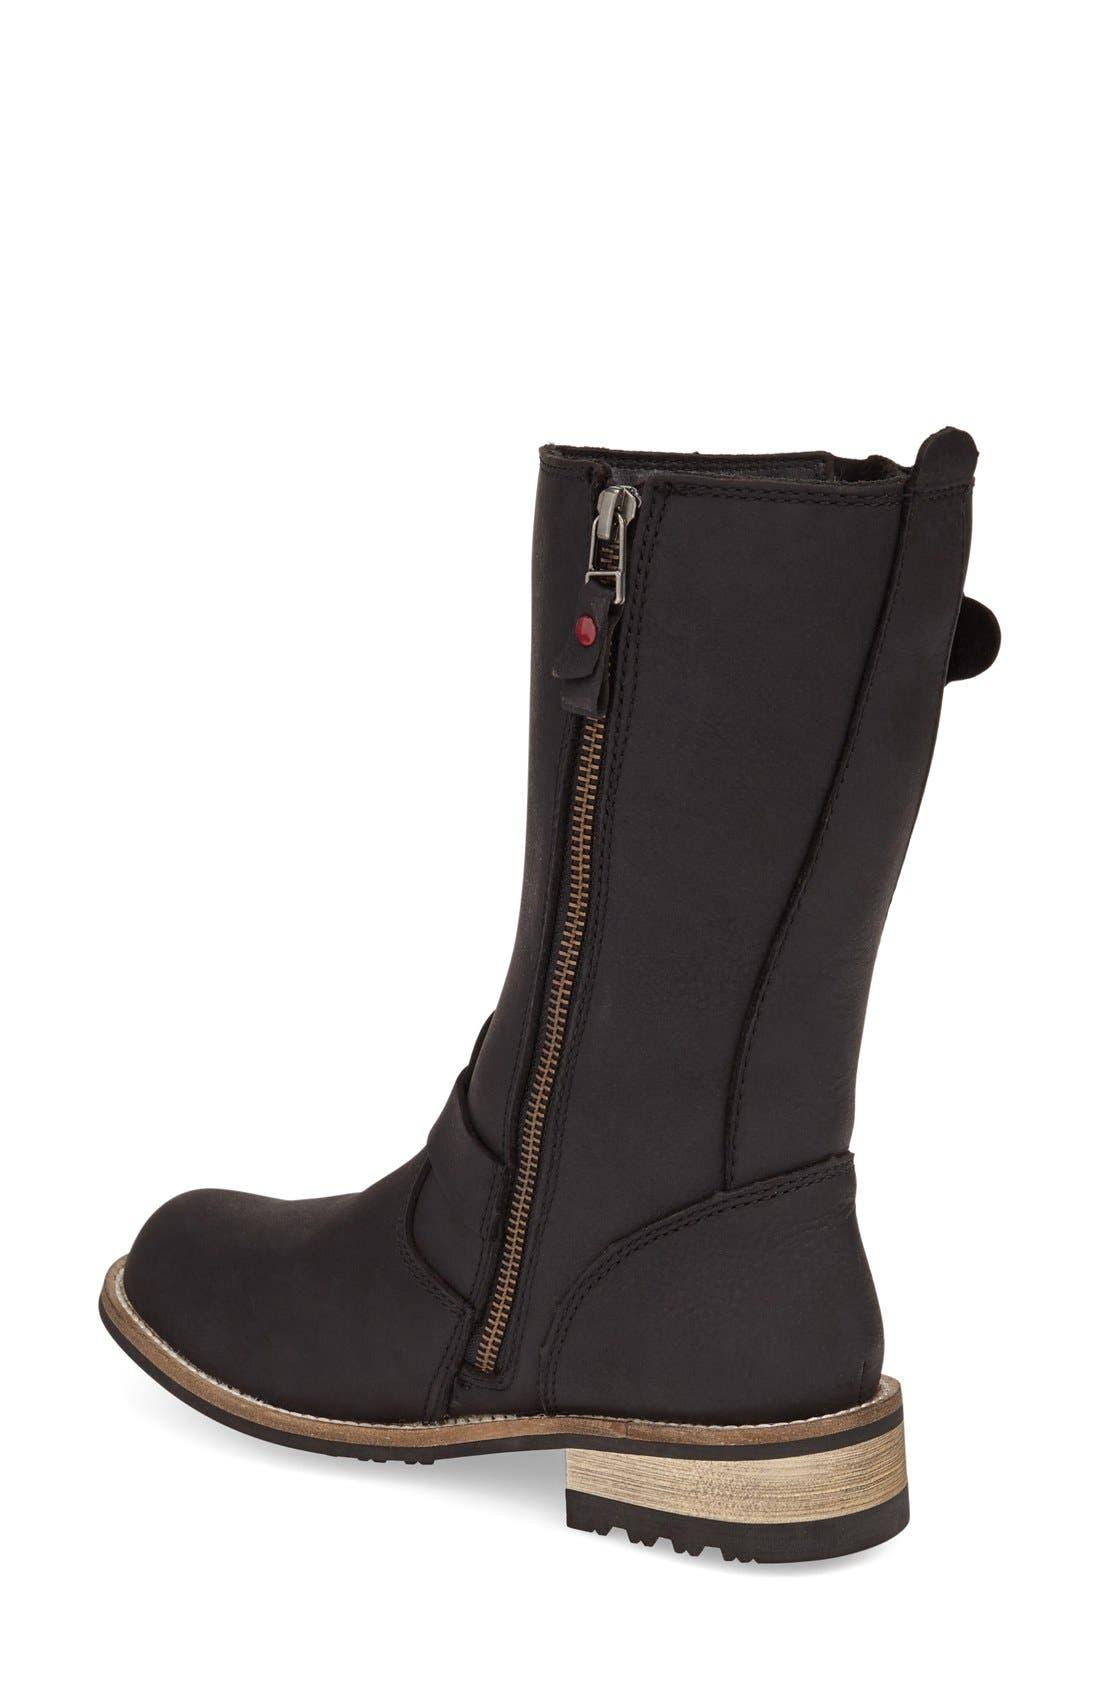 KODIAK,                             'Alcona' Waterproof Boot,                             Alternate thumbnail 2, color,                             BLACK LEATHER